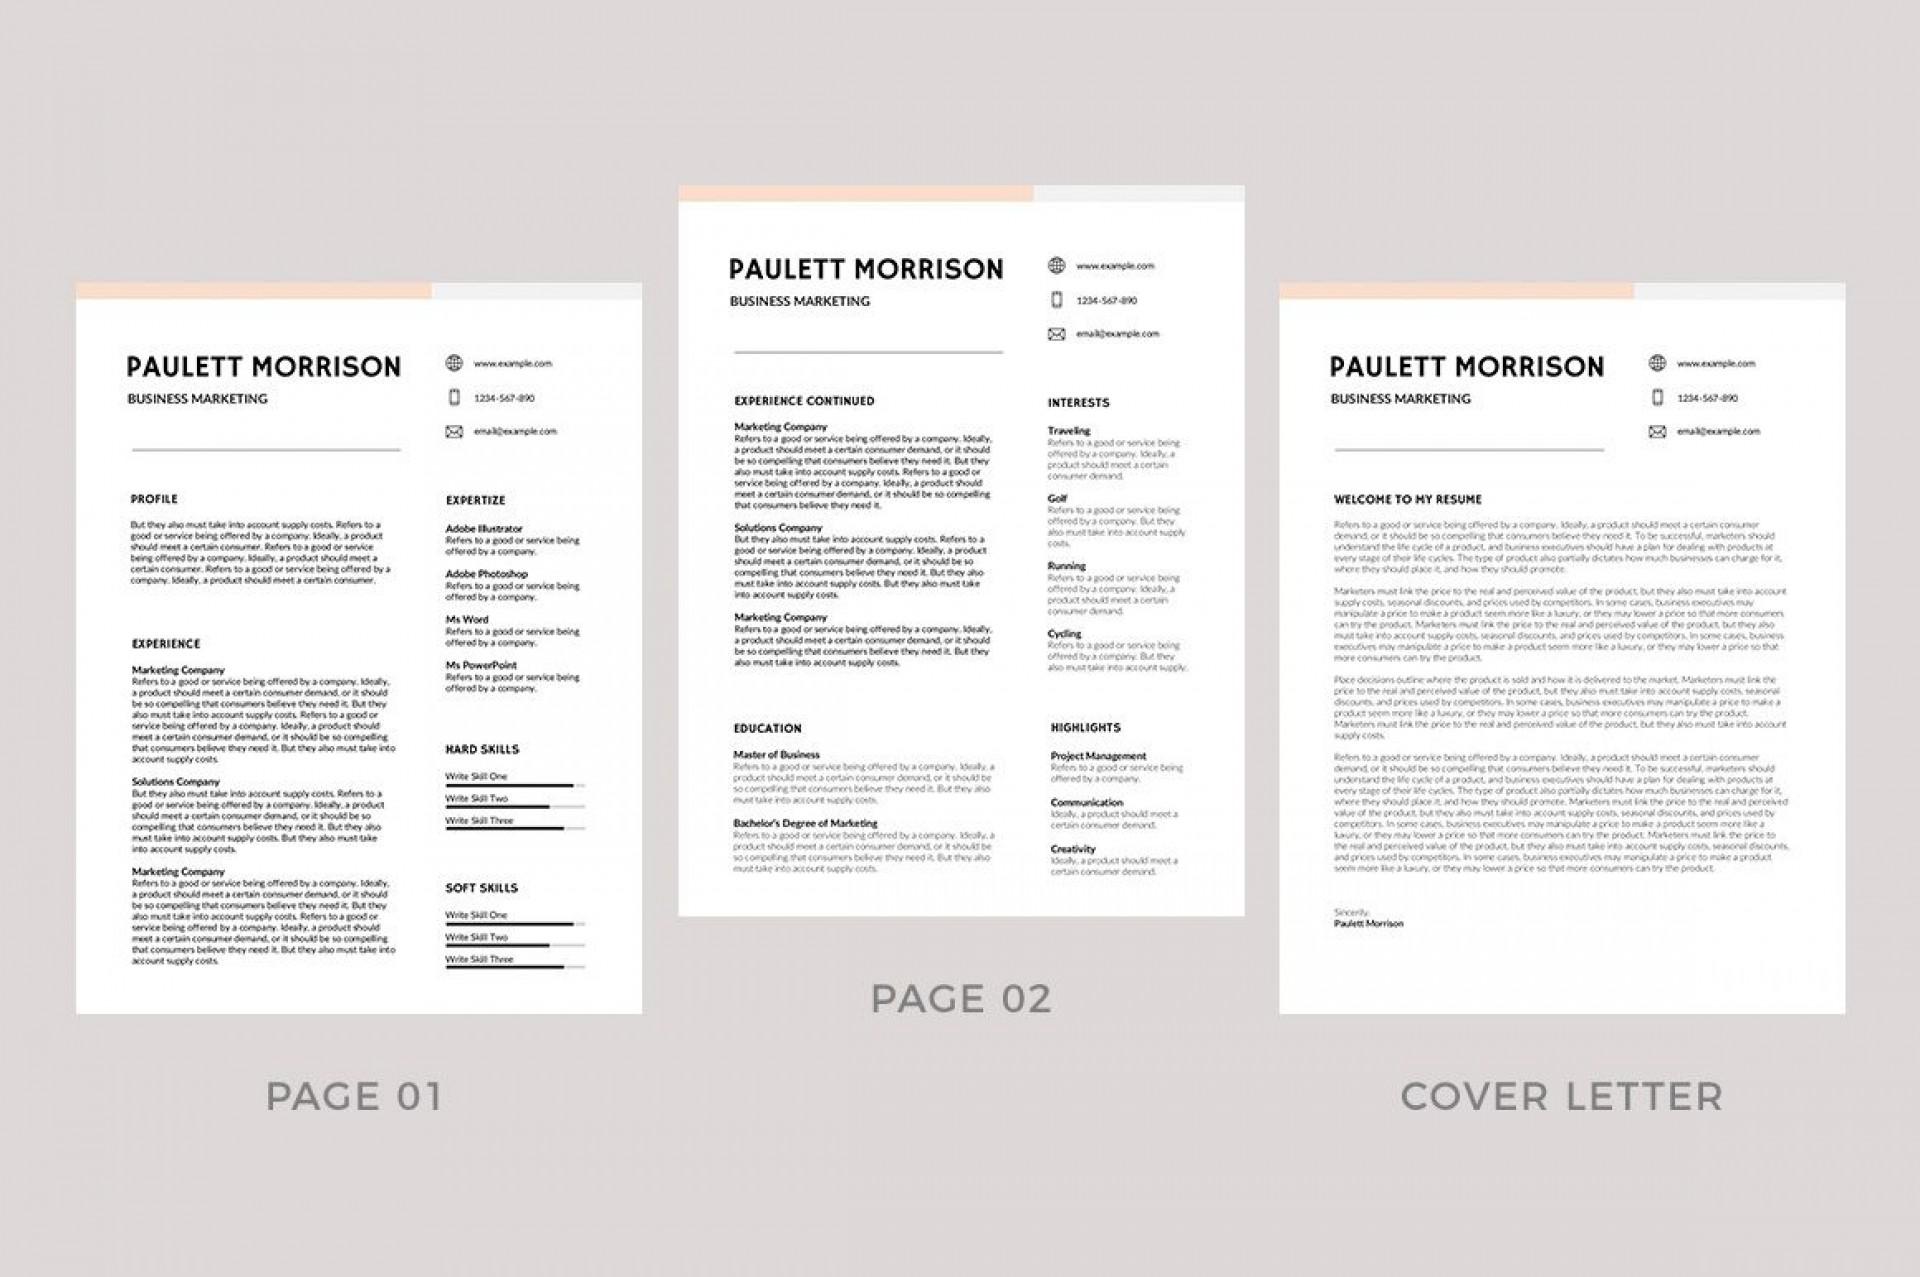 009 Sensational Download Resume Template Free Sample  For Mac Best Creative Professional Microsoft Word1920